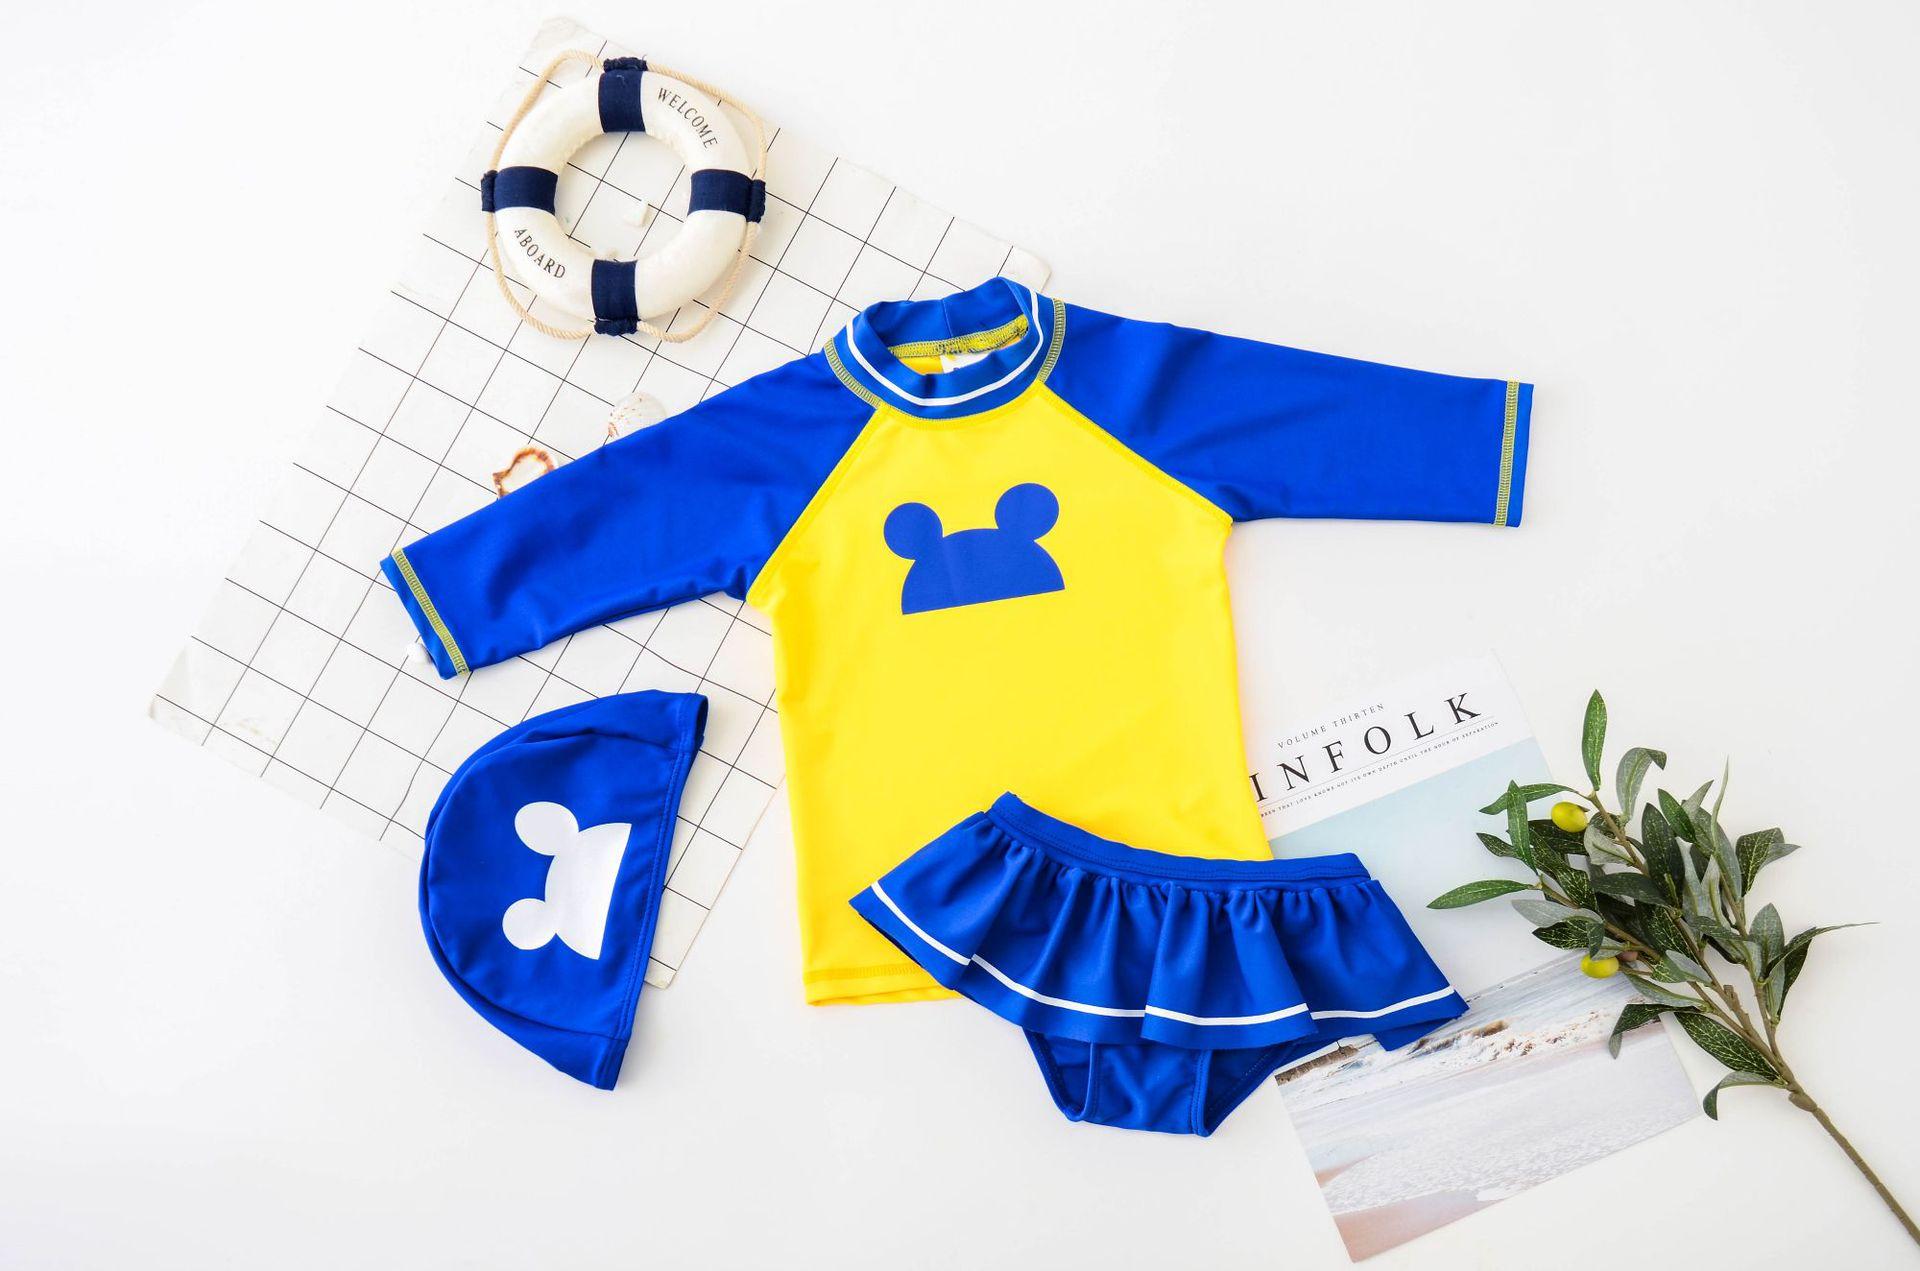 New Korean-style Split Type KID'S Swimwear Cartoon Skirt GIRL'S Swimsuit Sun-resistant Surf Wear CHILDREN'S Swimsuit